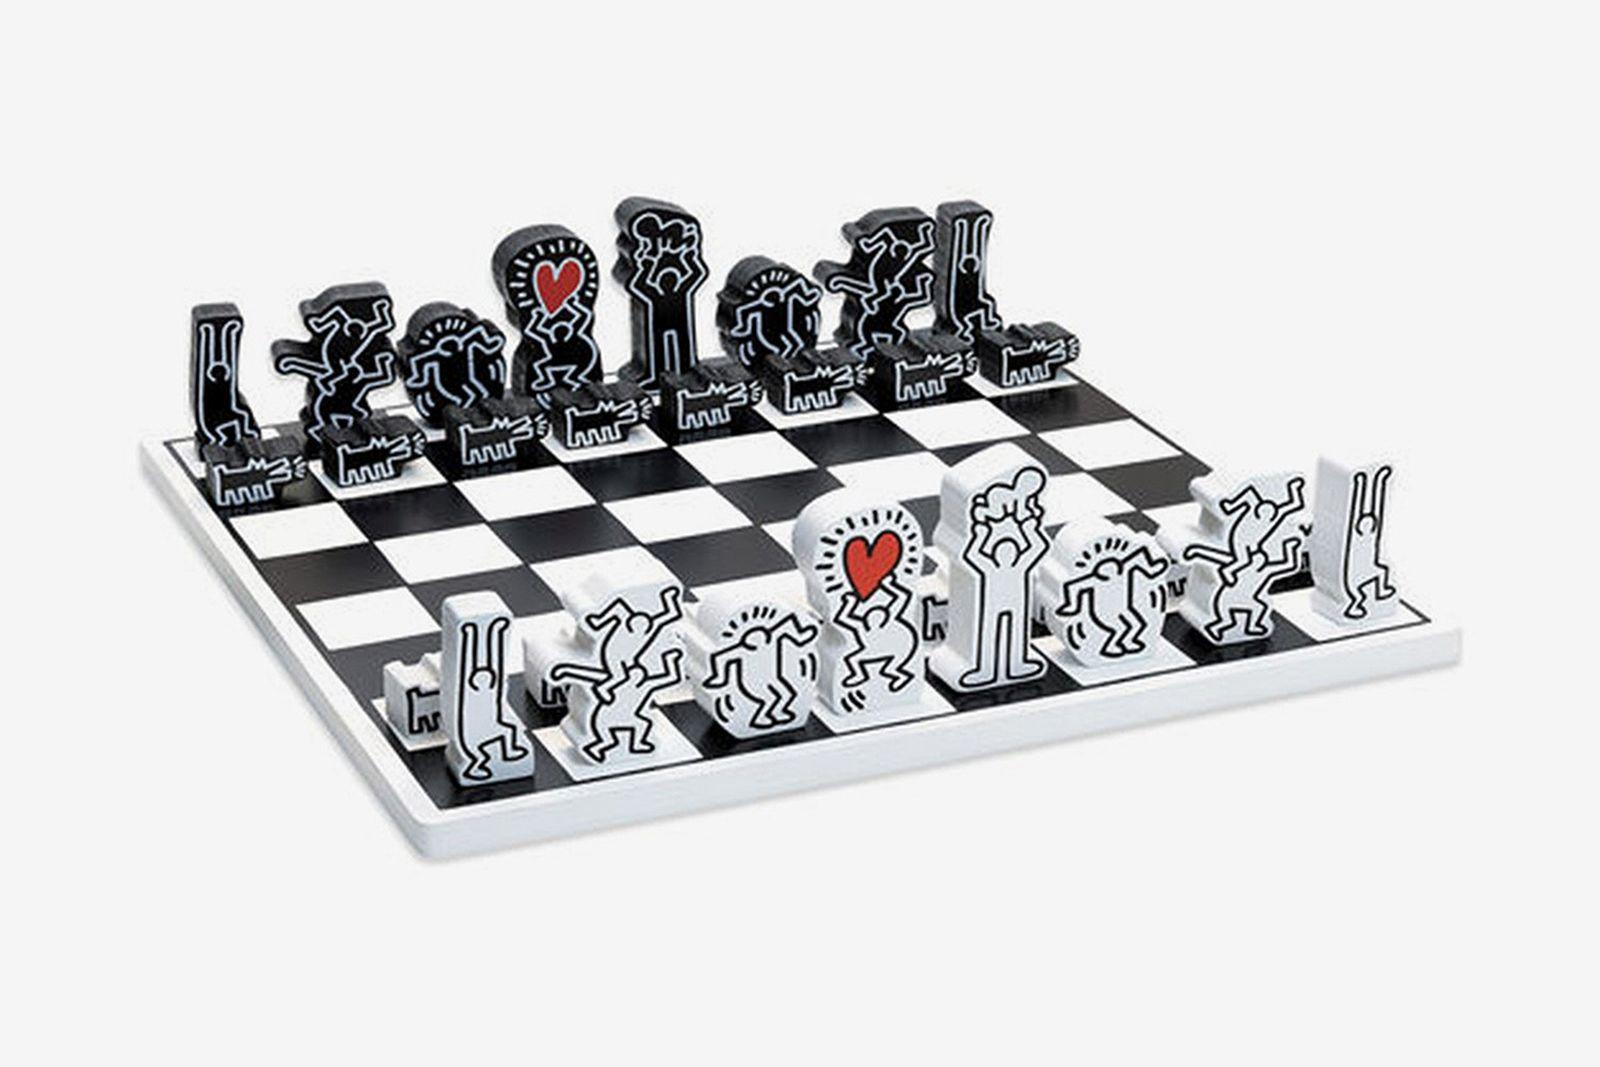 keith-haring-chess-set